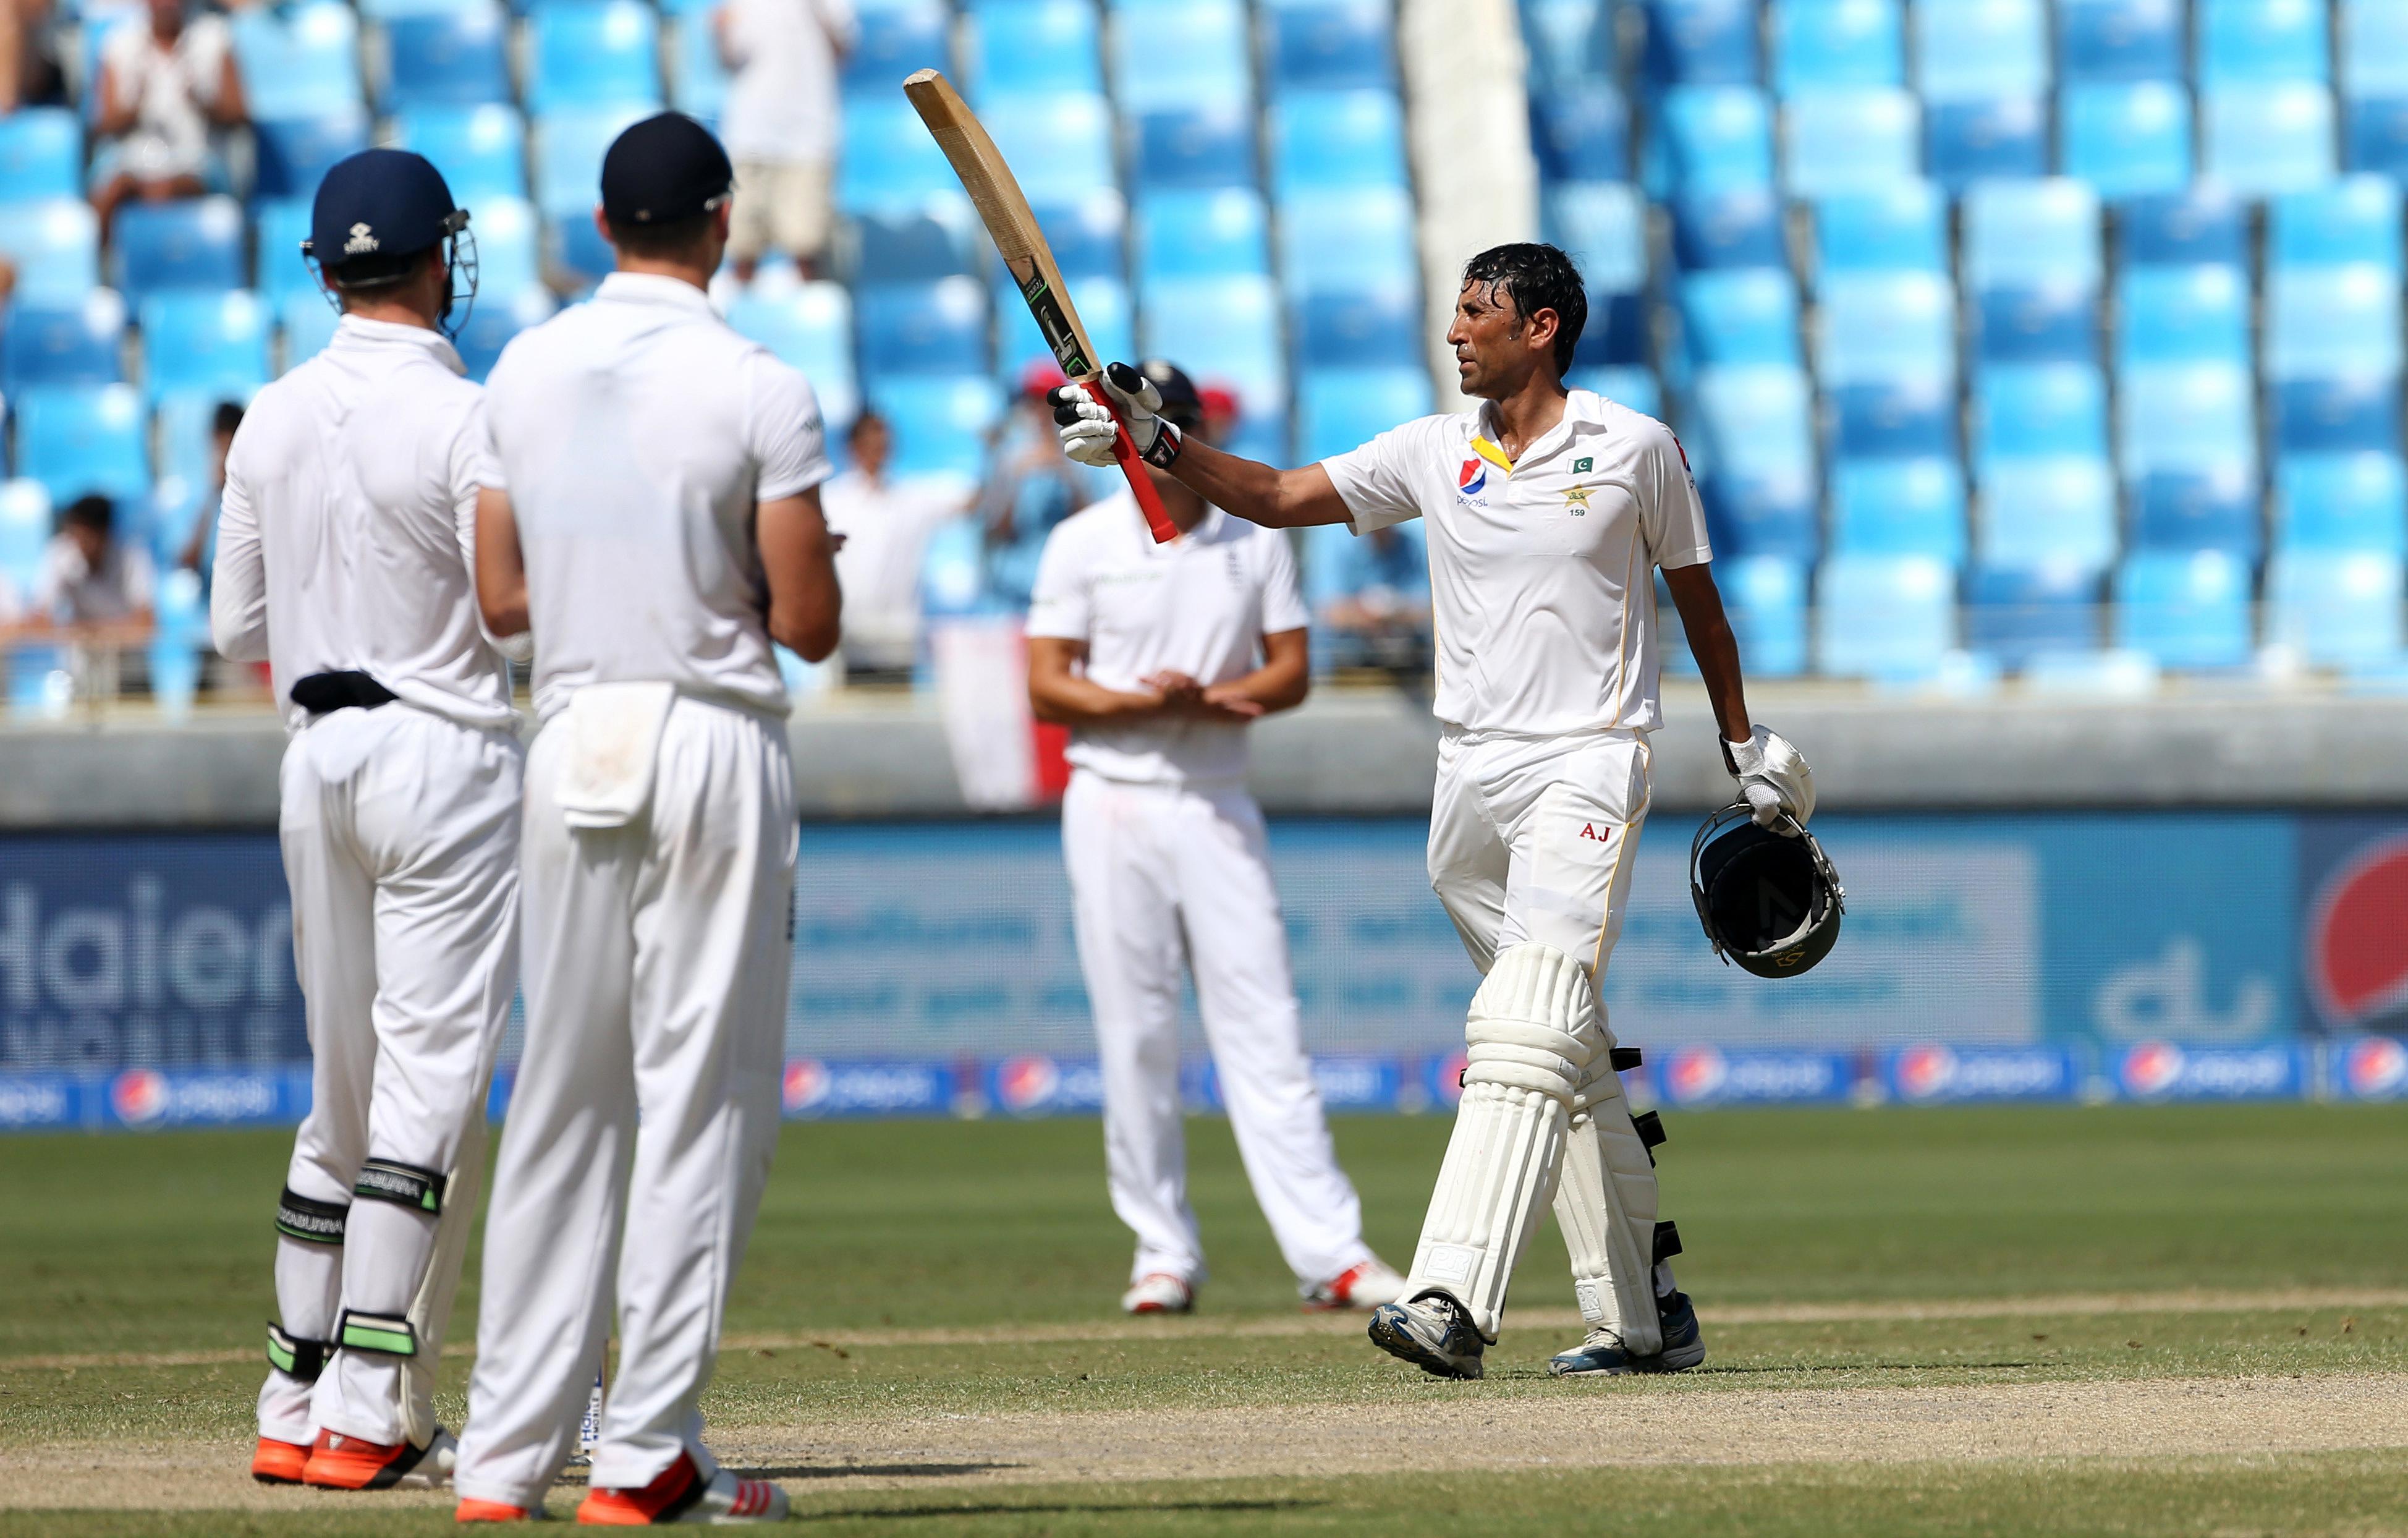 Pakistan's Younis Khan (right) celebrates scoring a century. Photo: Action Images via Reuters